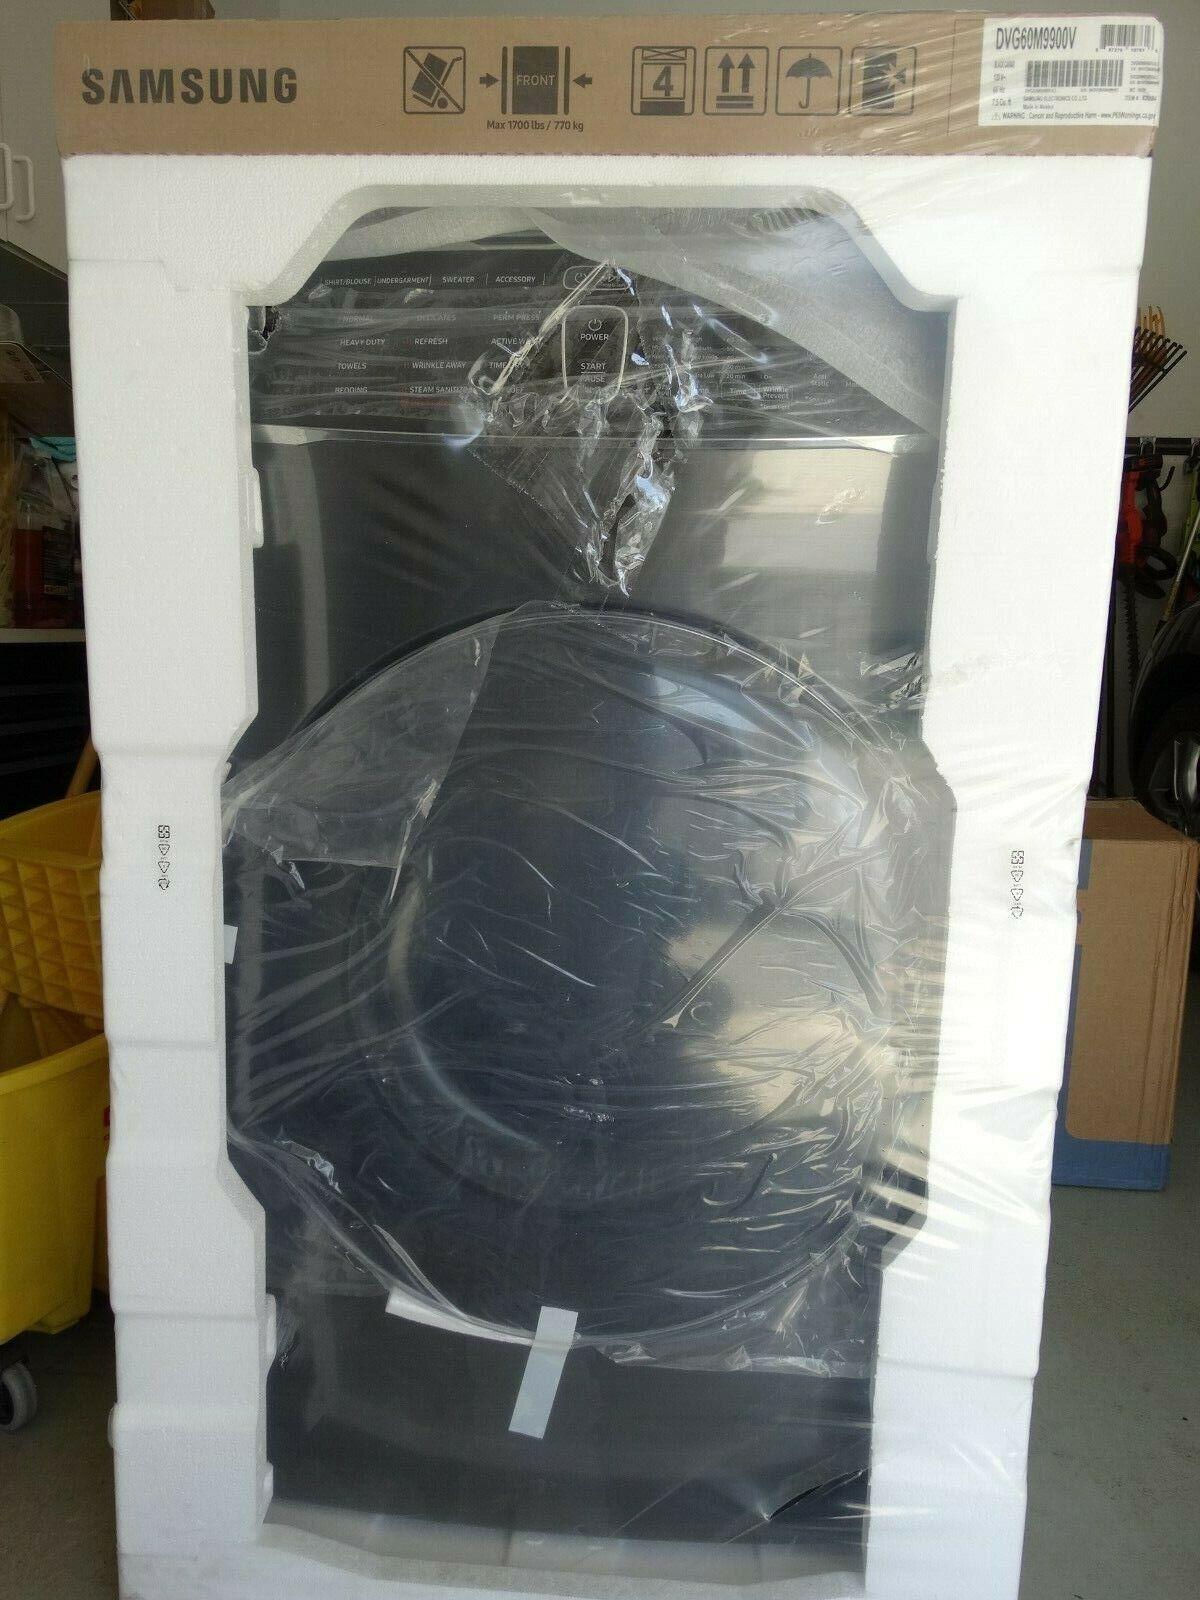 Samsung 7.5 cu ft FlexDry Gas Dryer (Black Stainless Steel) - DVG60M9900V